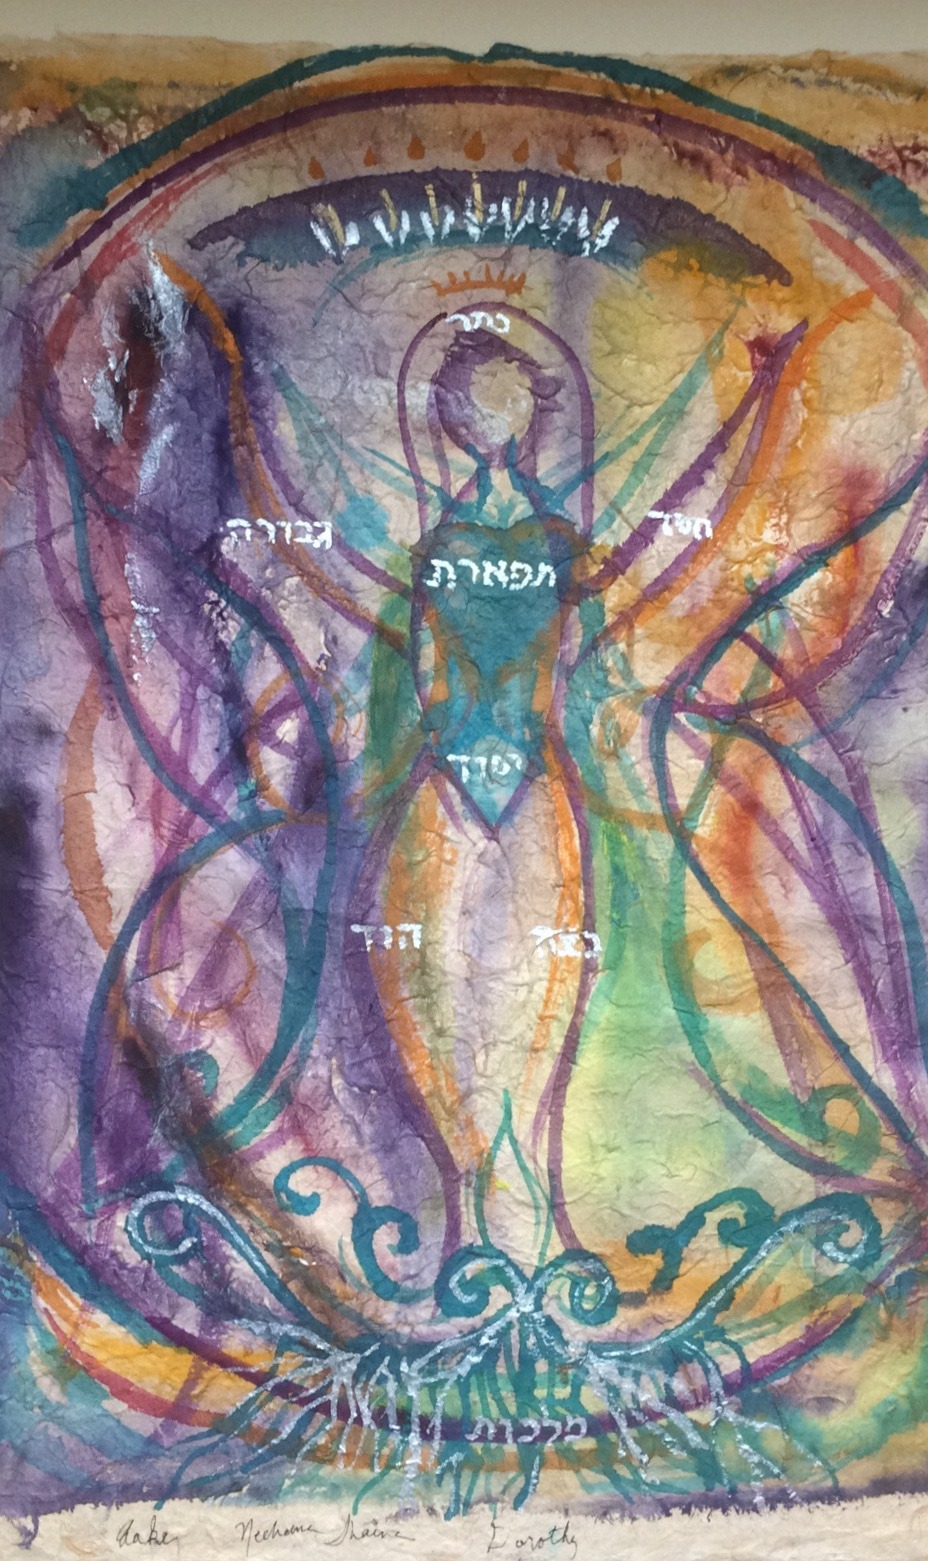 She is a Tree of Life   by Nechama Shaina